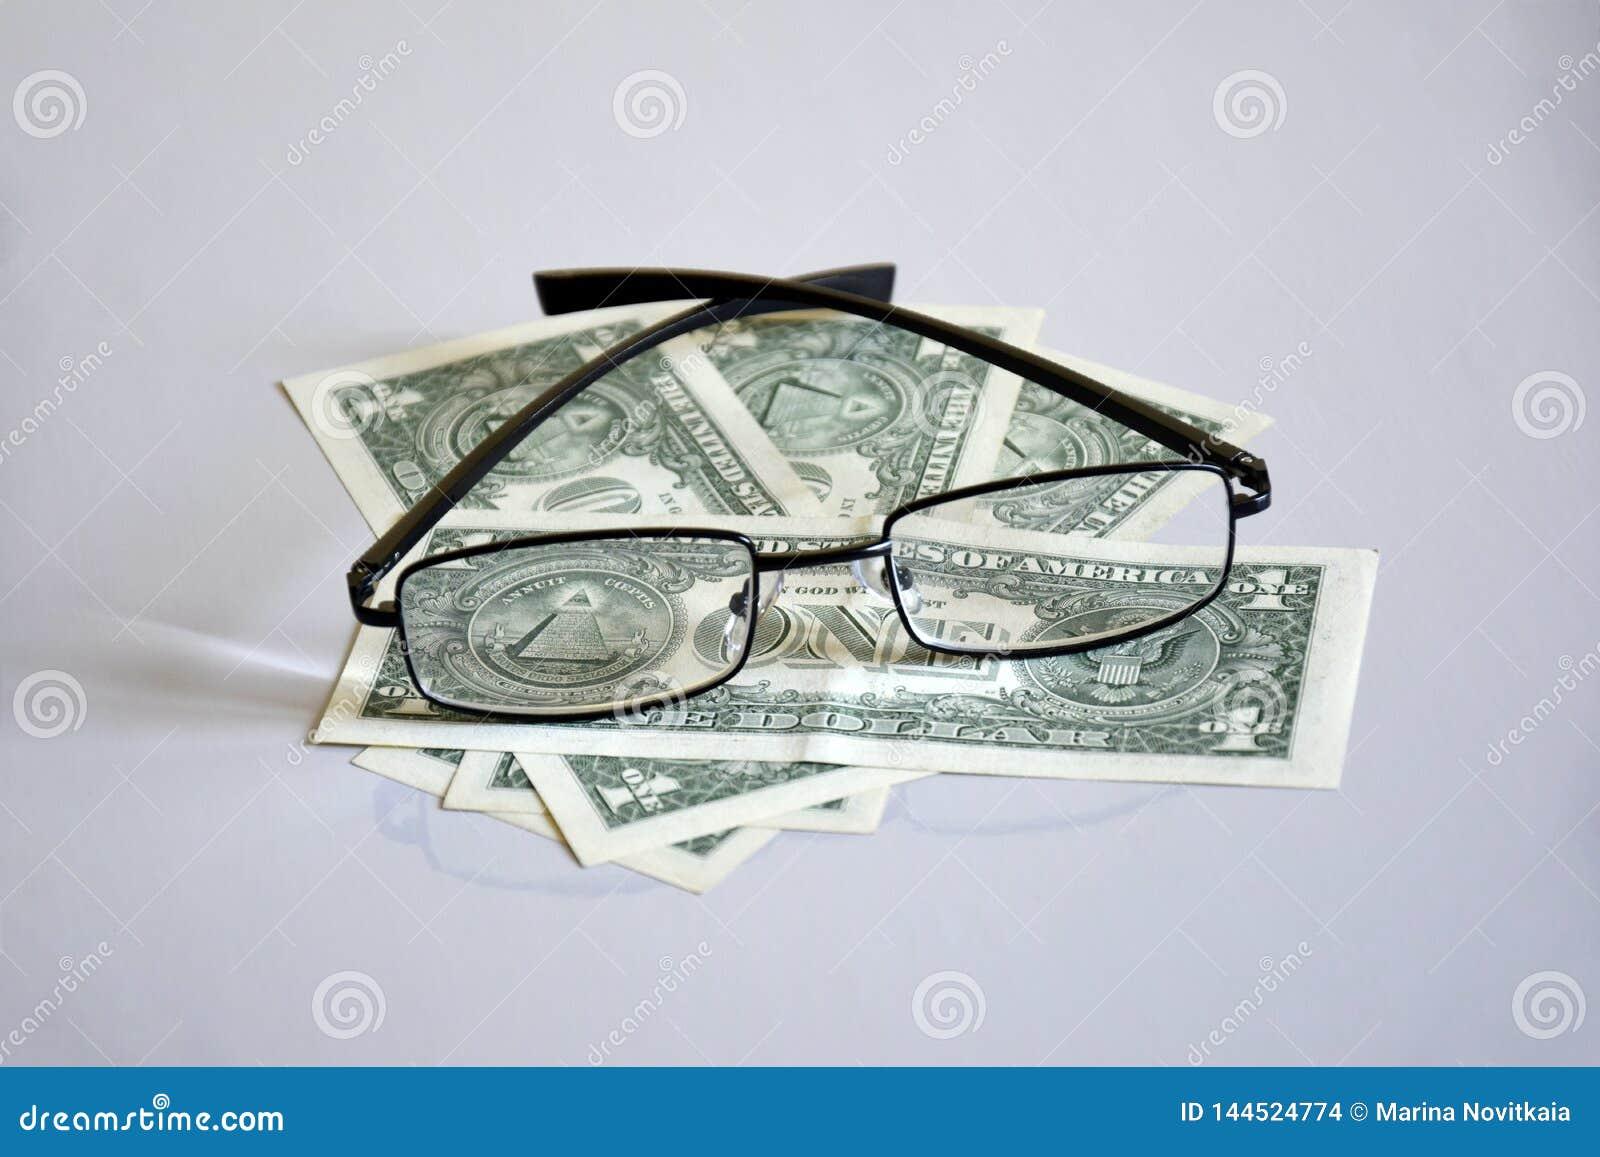 View on $ 1 pyramid through glasses